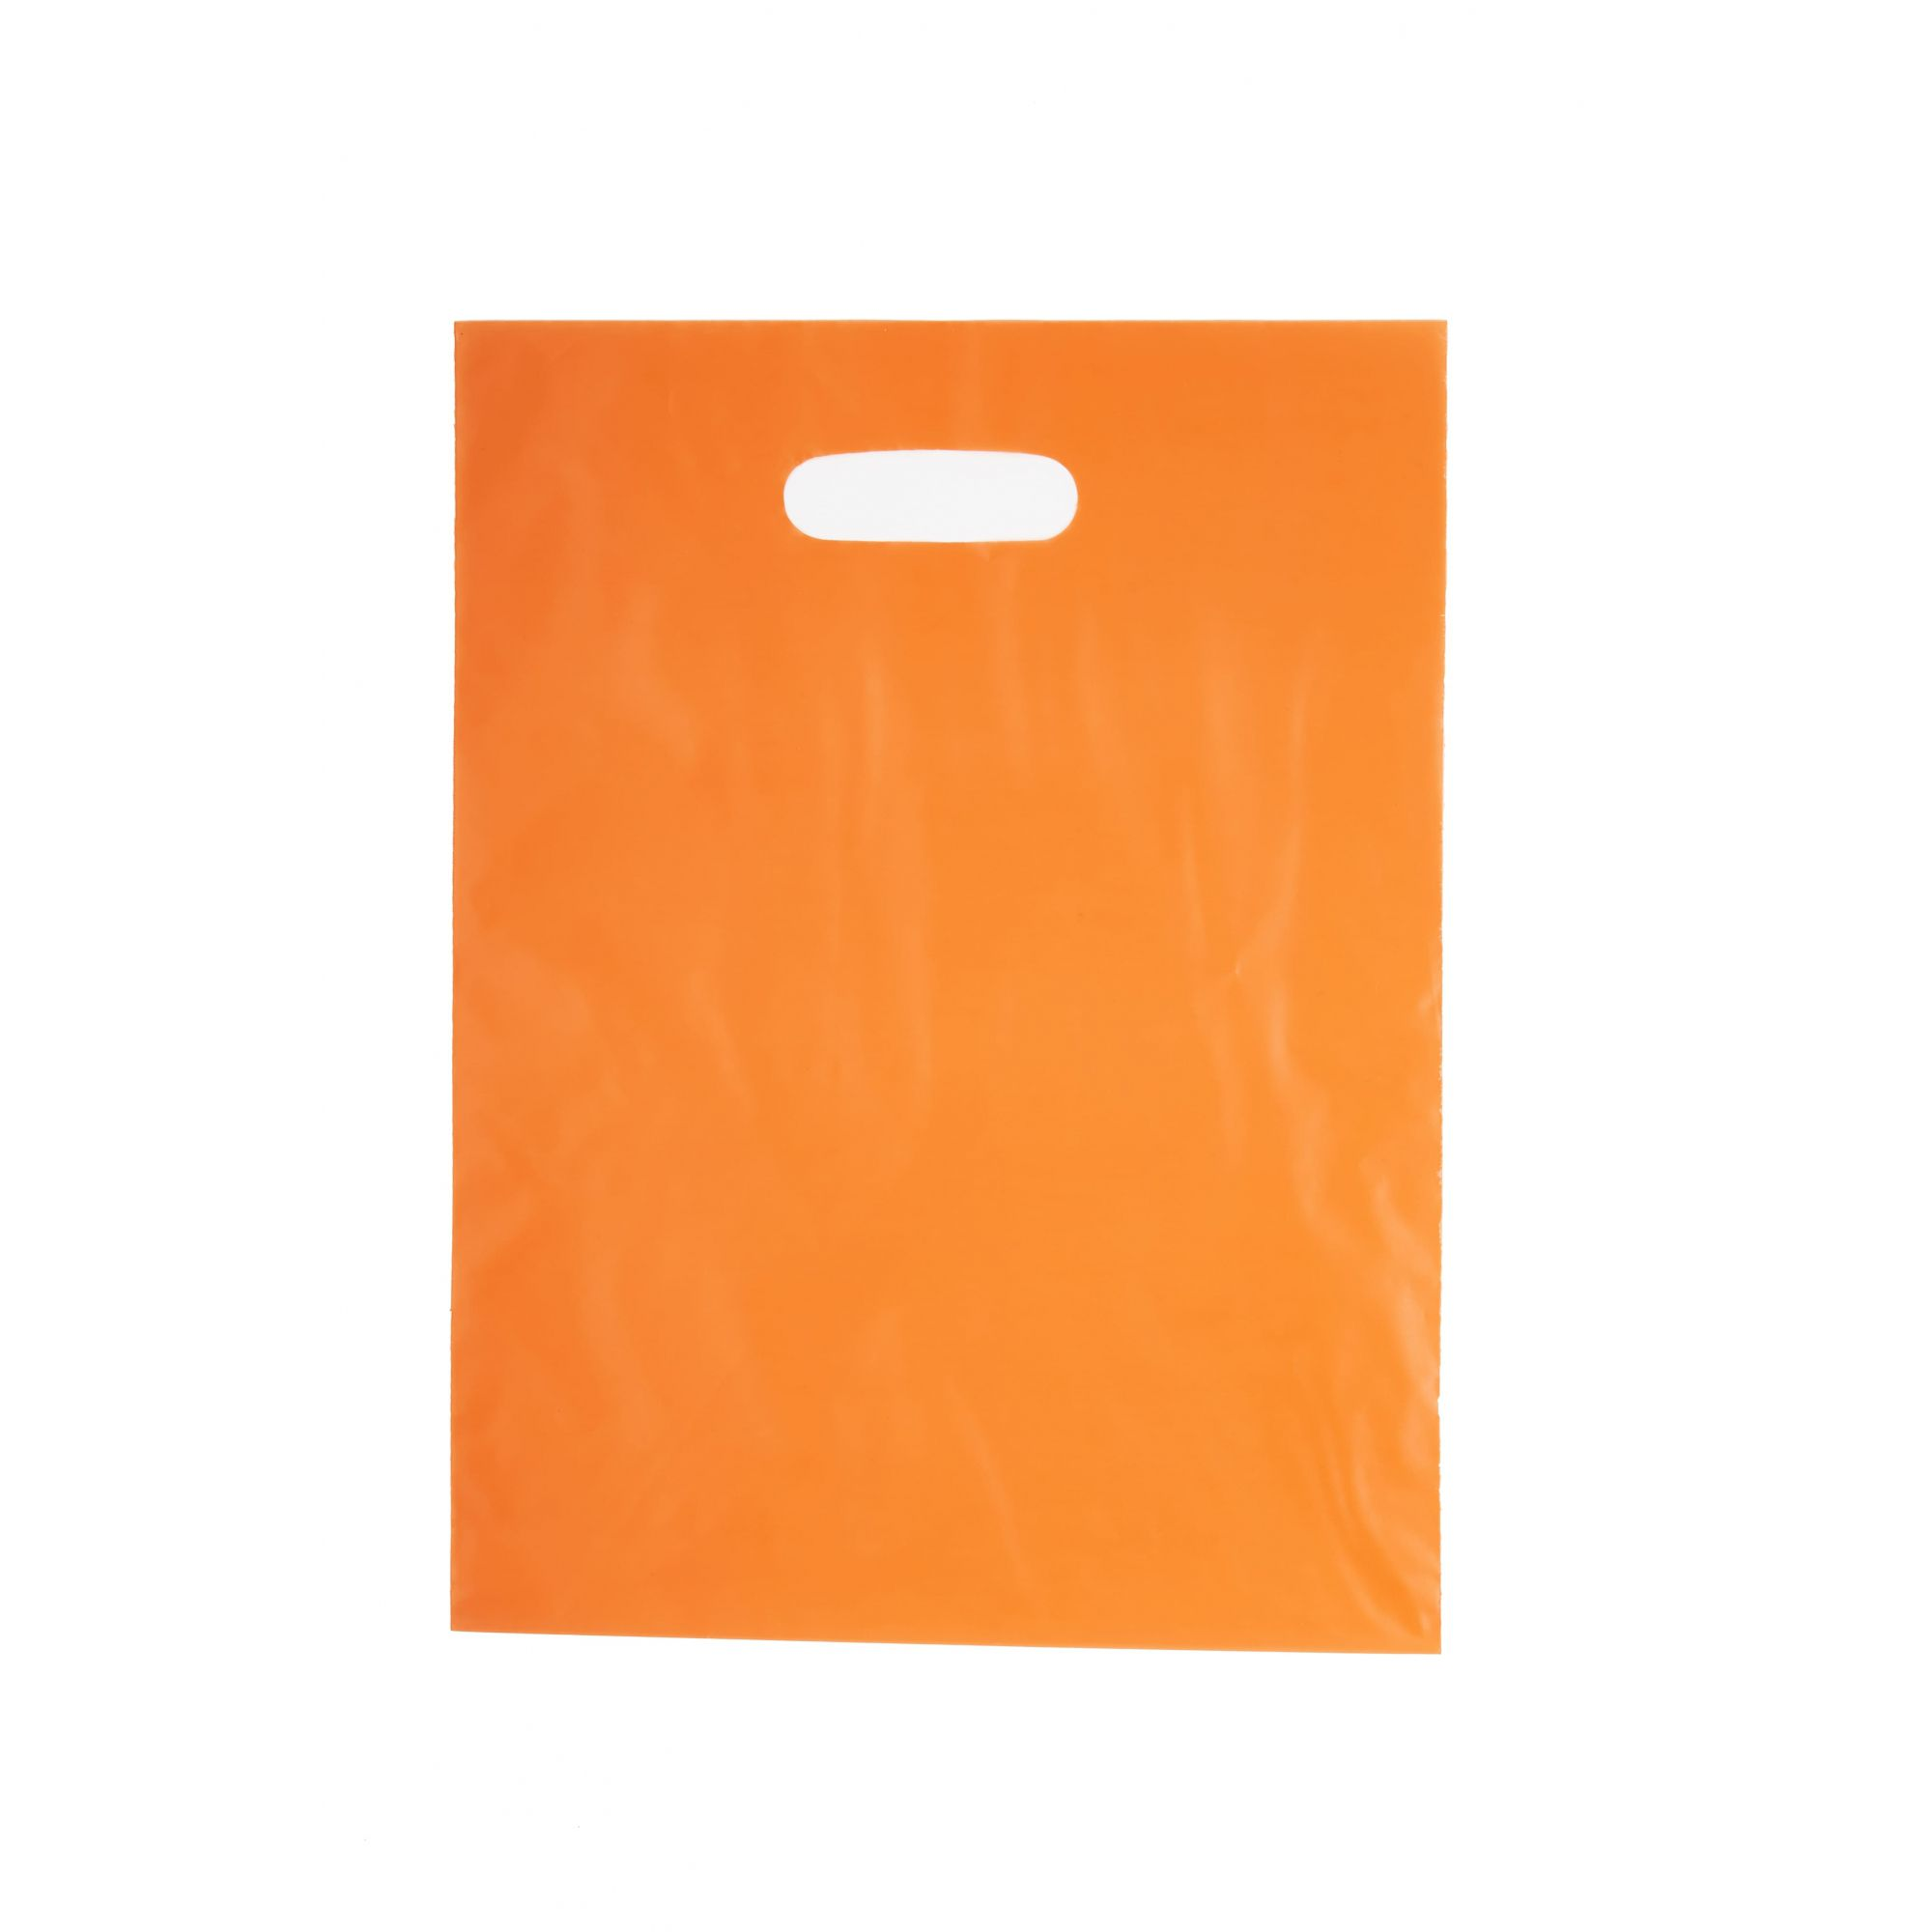 Sacola Plástica 35x44 Laranja - Alça Boca de Palhaço